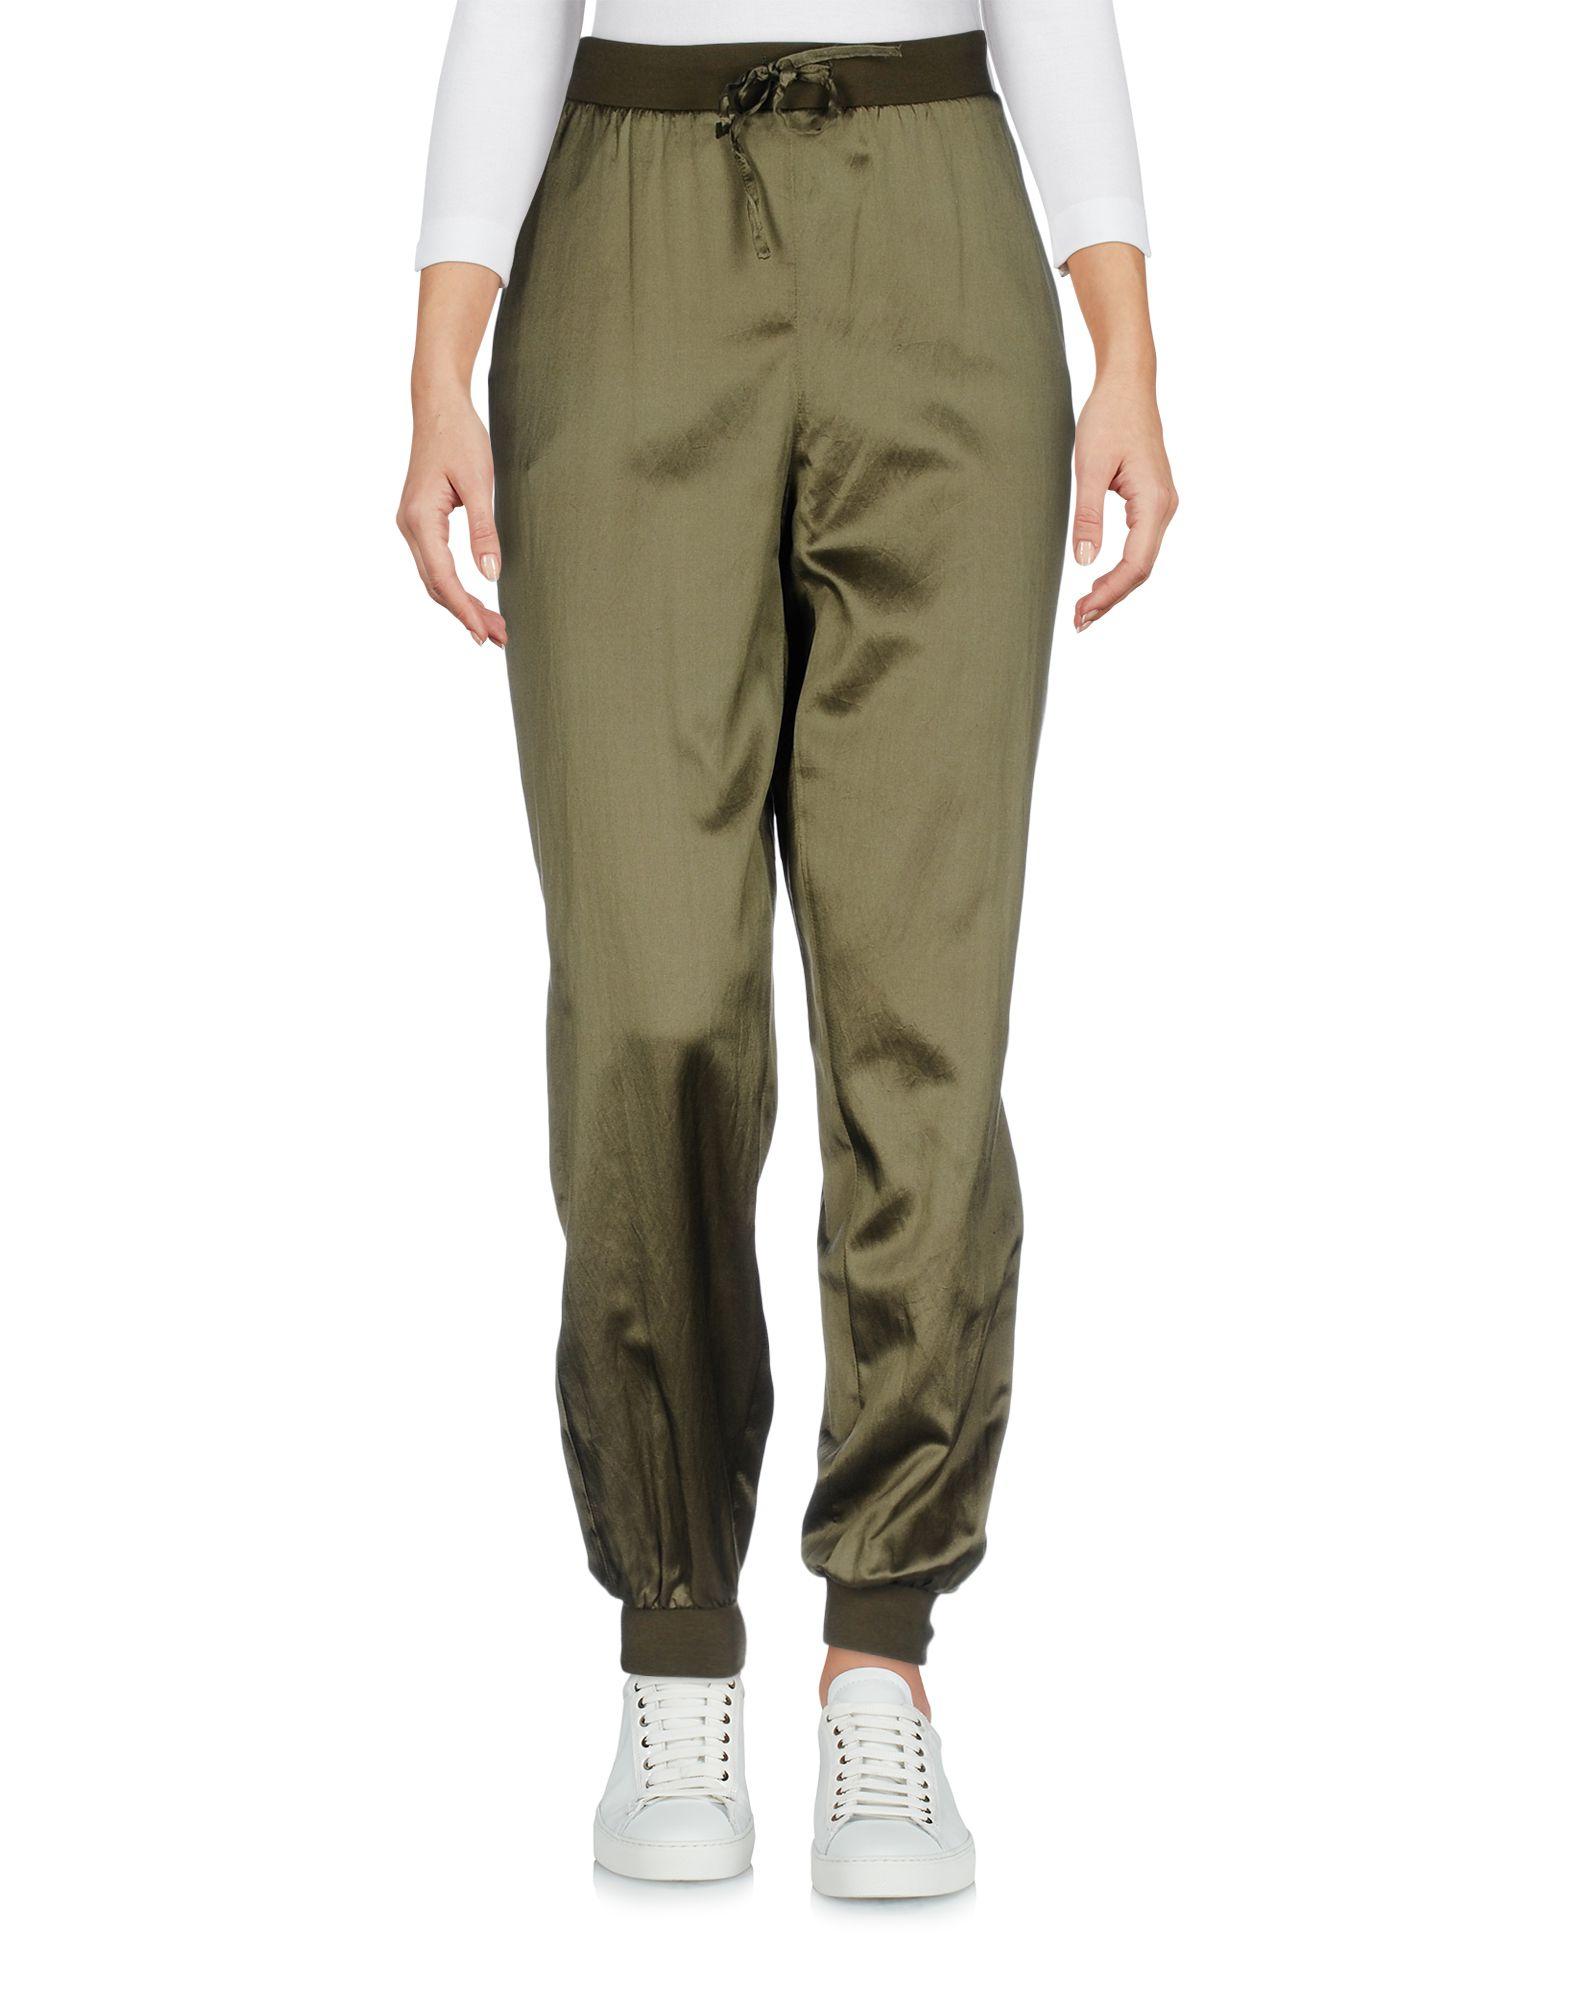 ERMANNO DI SCERVINO Damen Hose Farbe Militärgrün Größe 4